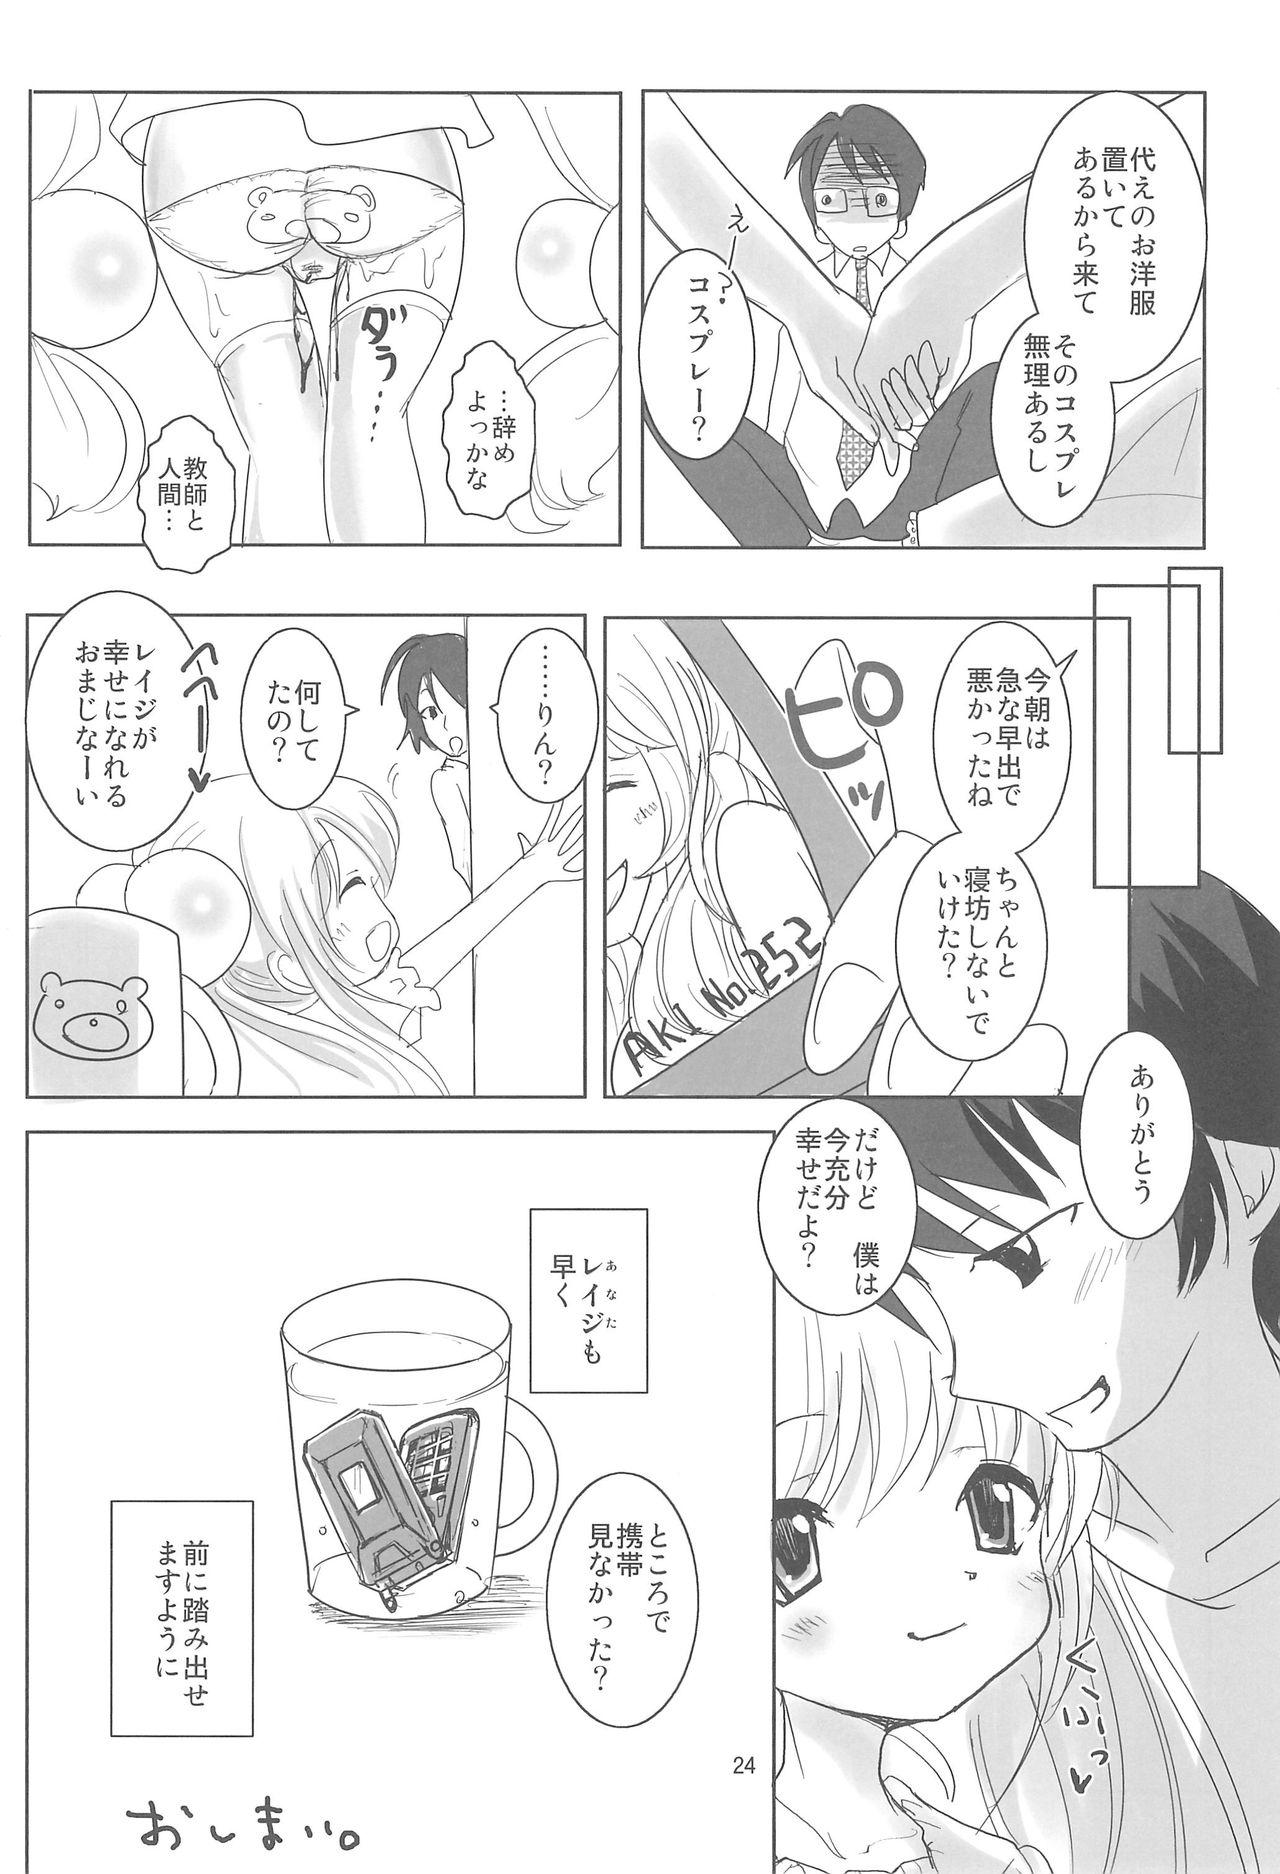 Crayon Rin-chan 22